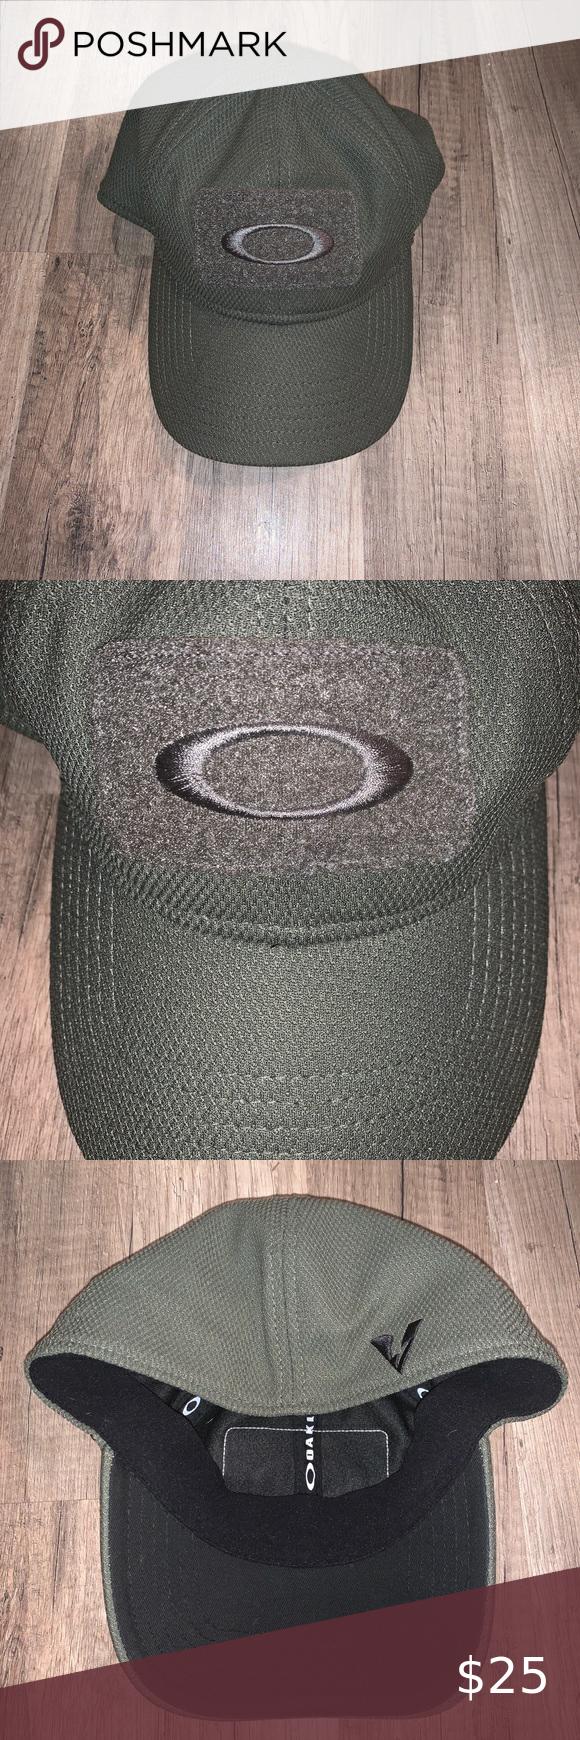 Men S Oakley Tactical Hat Men S Size L Xl Fitted Oakley Military Green Tactical Hat Oakley Accessories Hats In 2020 Oakley Tactical Tactical Hat Oakley Military